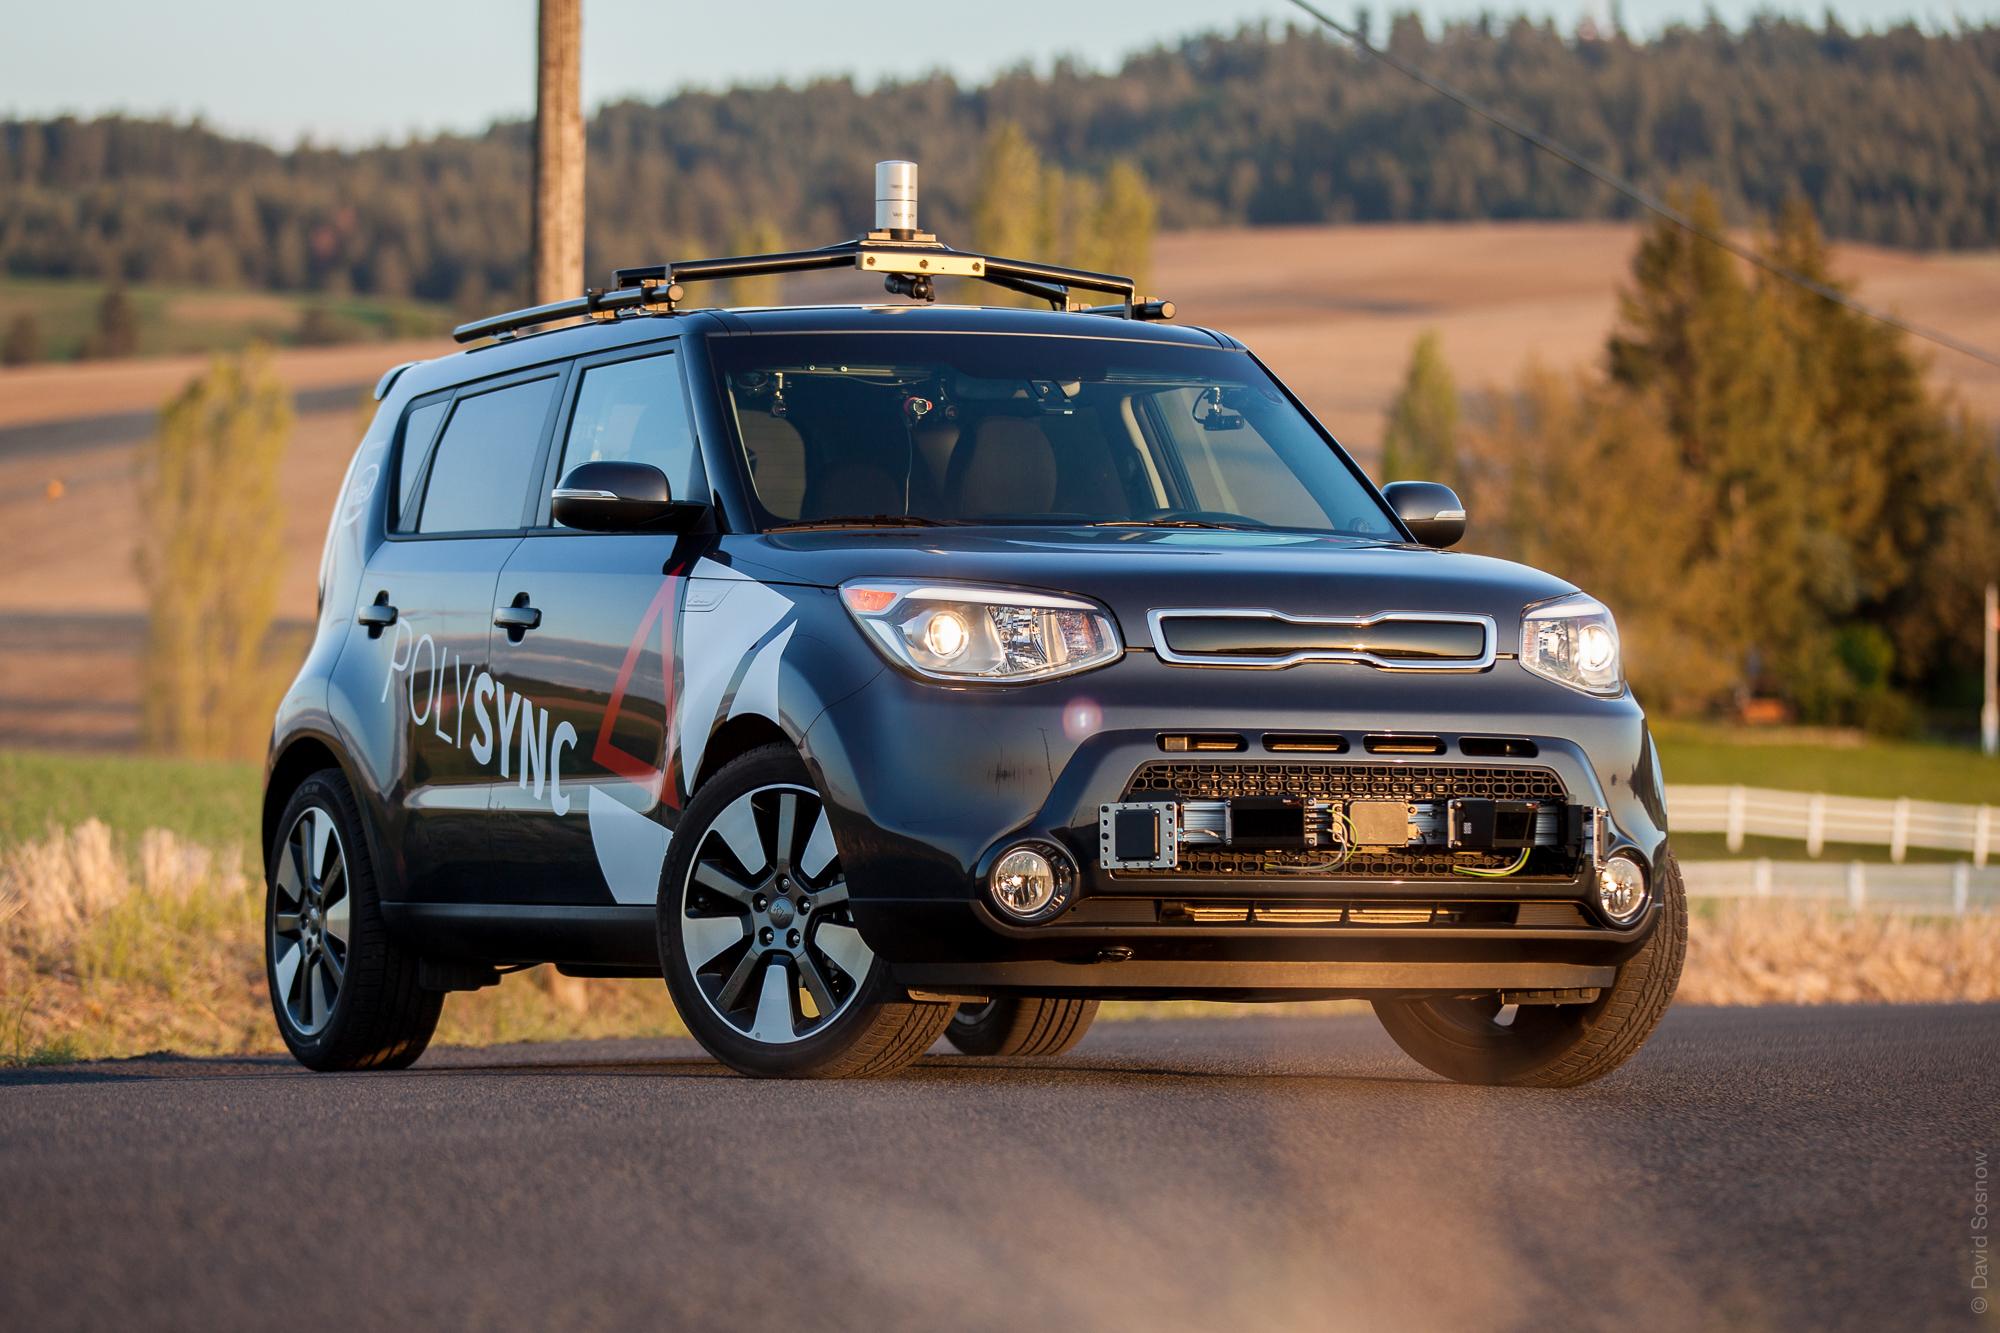 PolySync is among the Top Ten Automotive Startups picked by the LA Auto Show's AutoMobility LA.